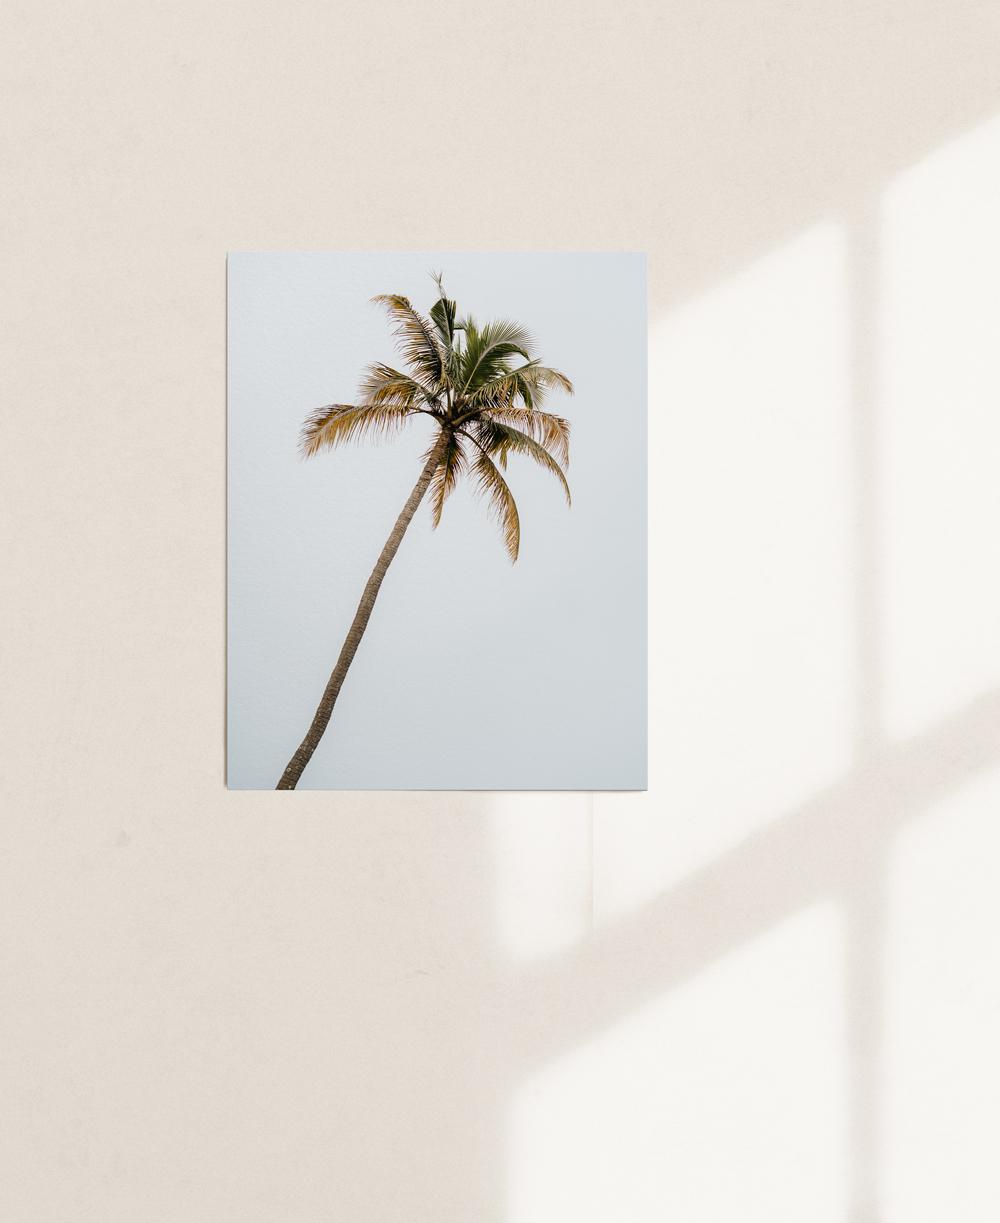 nicischwab-prints-02-006